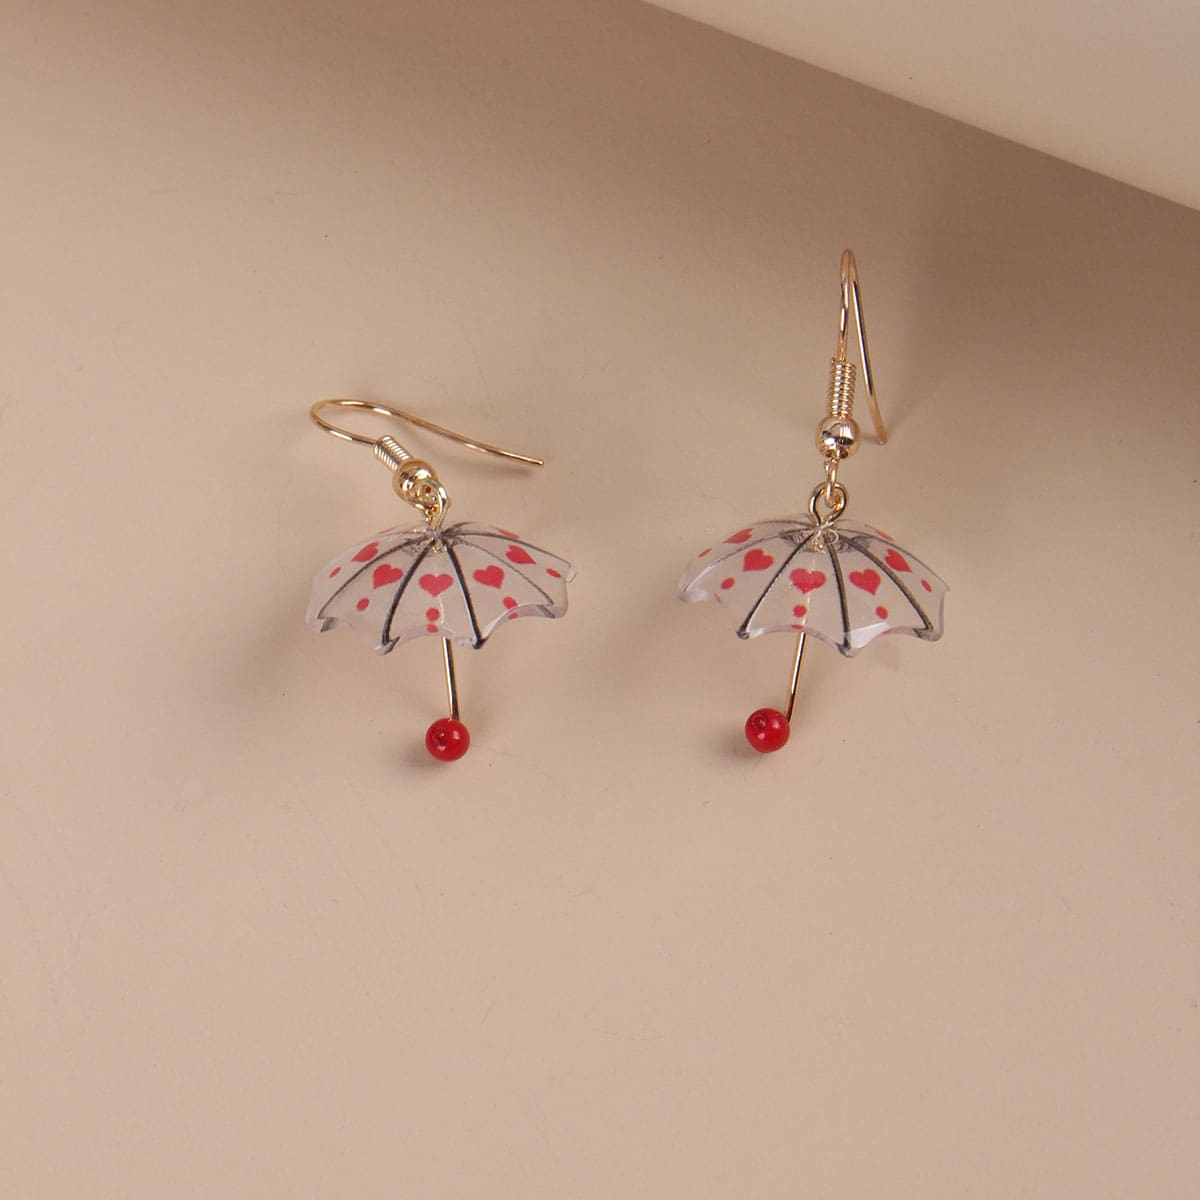 Зонт Серьги-подвески от SHEIN